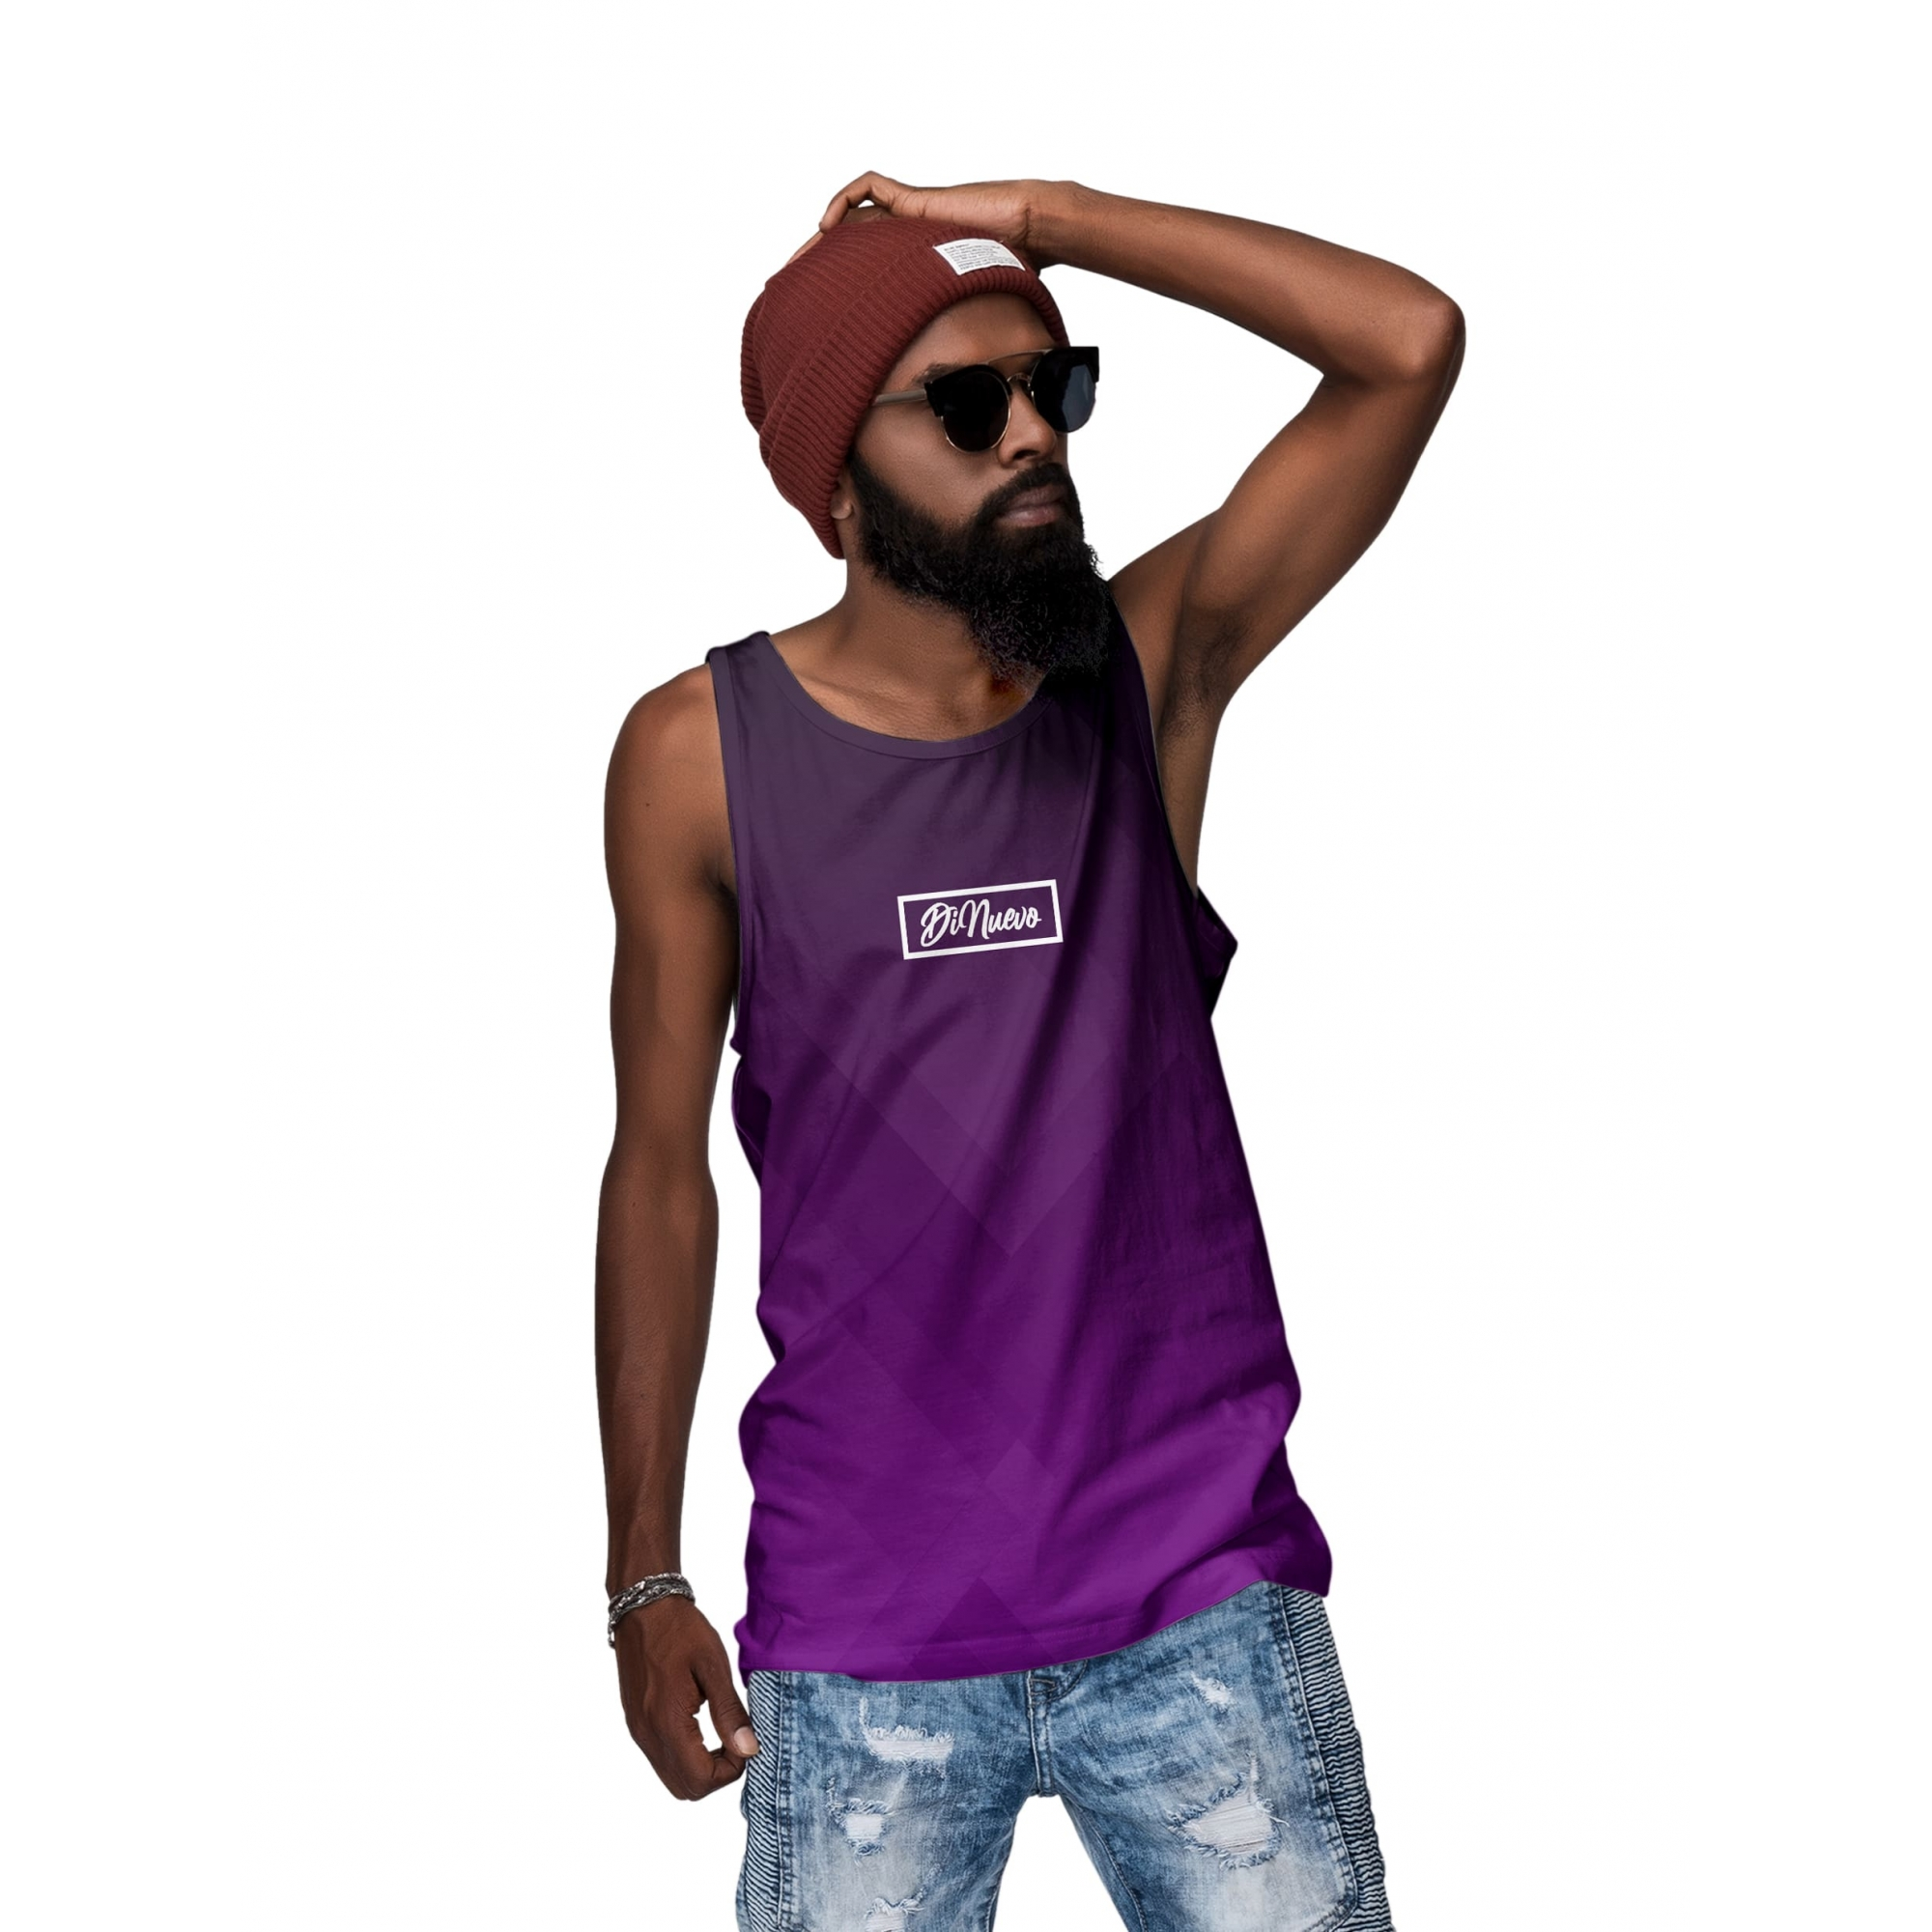 Camiseta Regata Roxa Masculina Full Print Geométrica